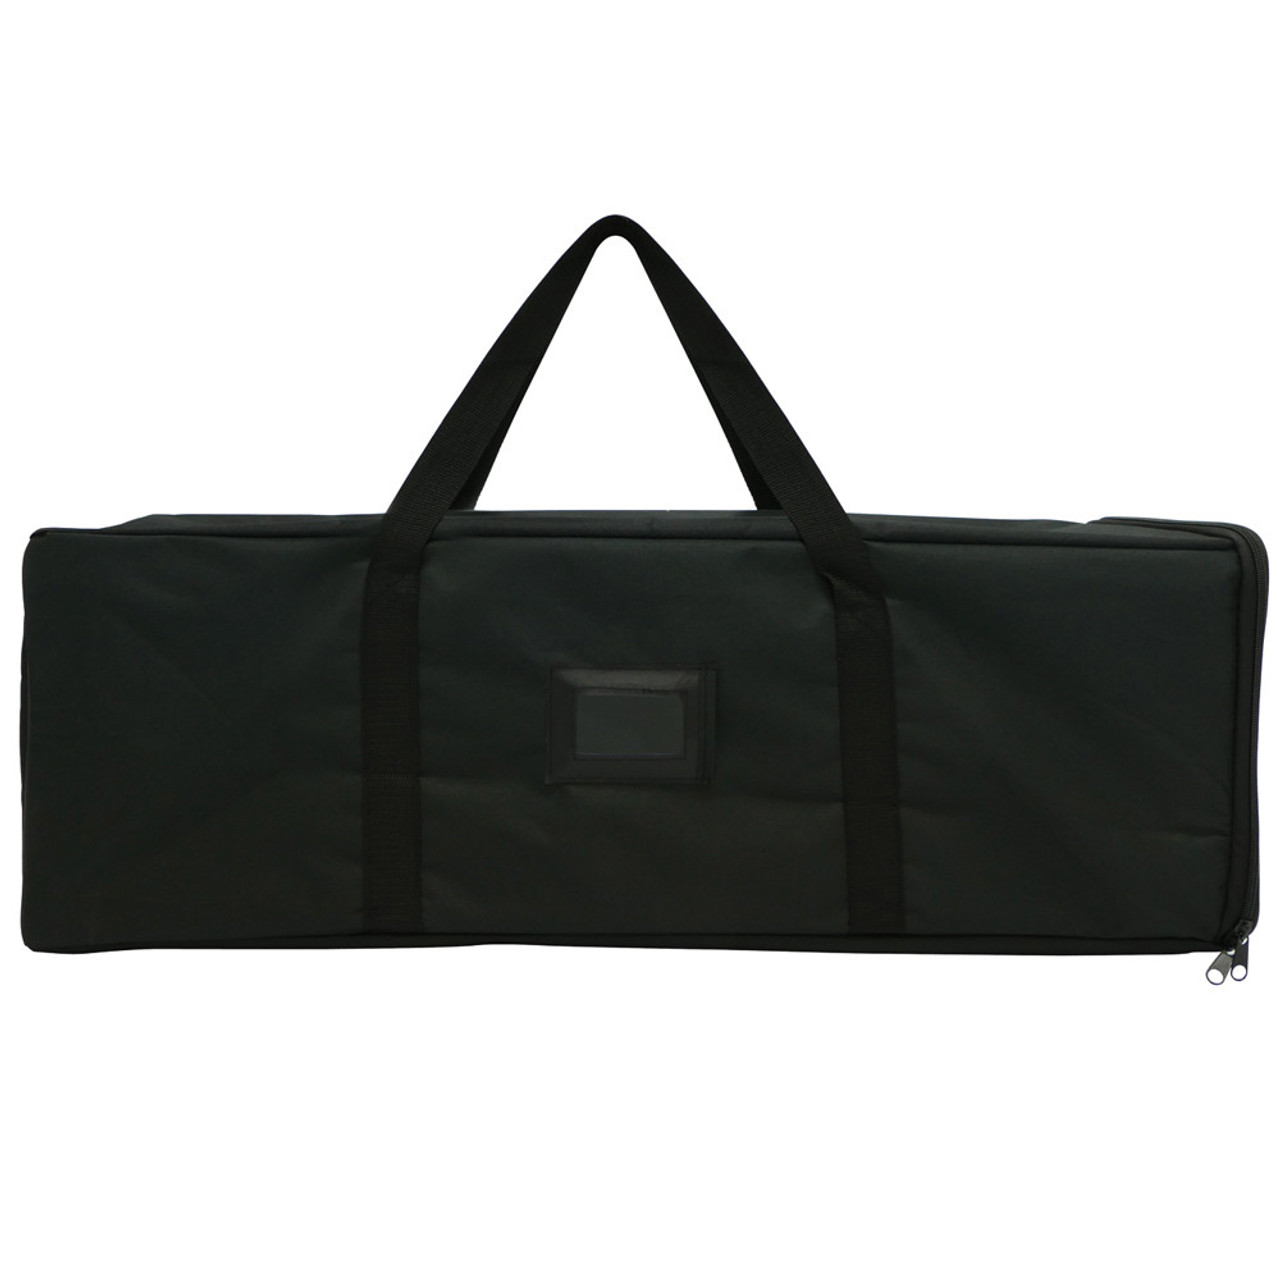 Standard travel bag (included)